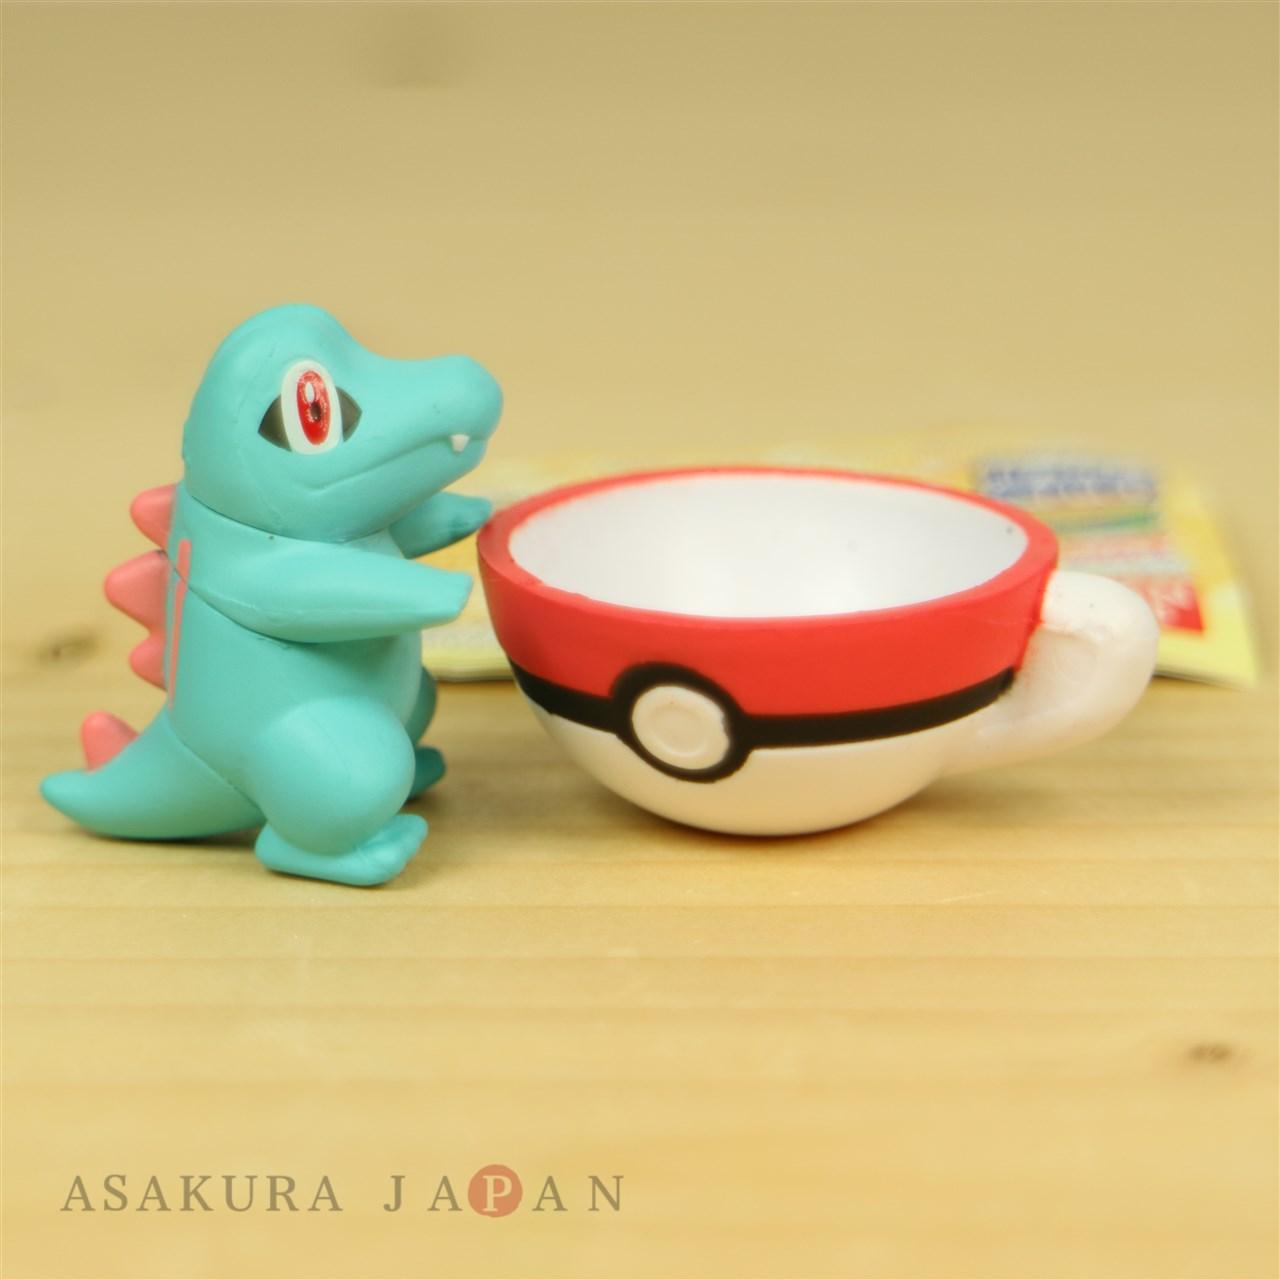 Pokemon Teacup Time Mascot Volume 2 Mini Figure Collection 0483095 Gashapon Tea Cup 4 24573 Gacha Vol4 Totodile Bandai 18072110